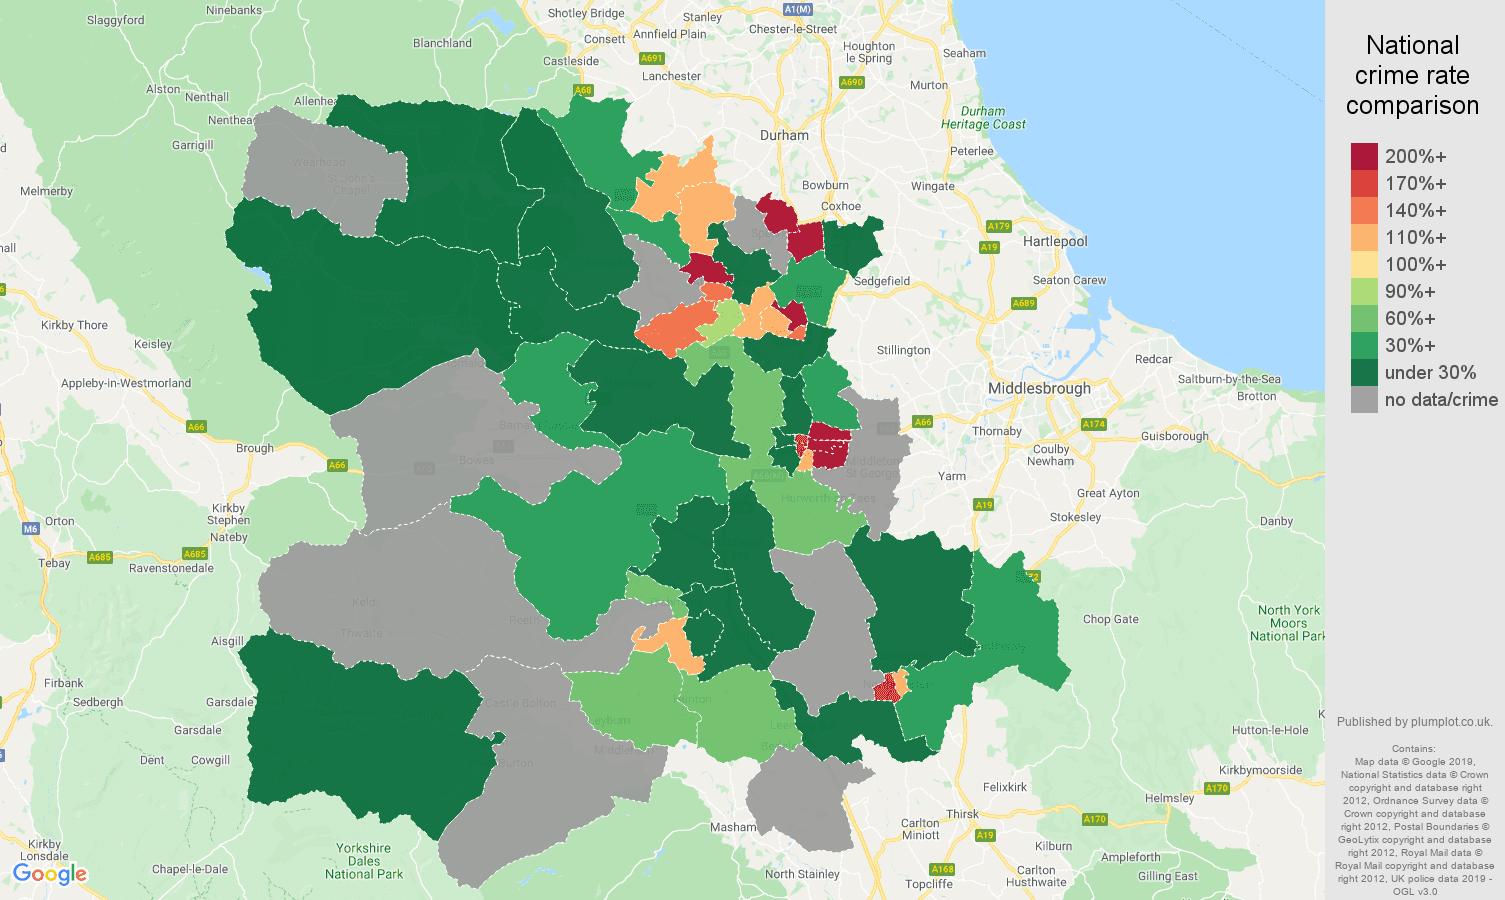 Darlington shoplifting crime rate comparison map